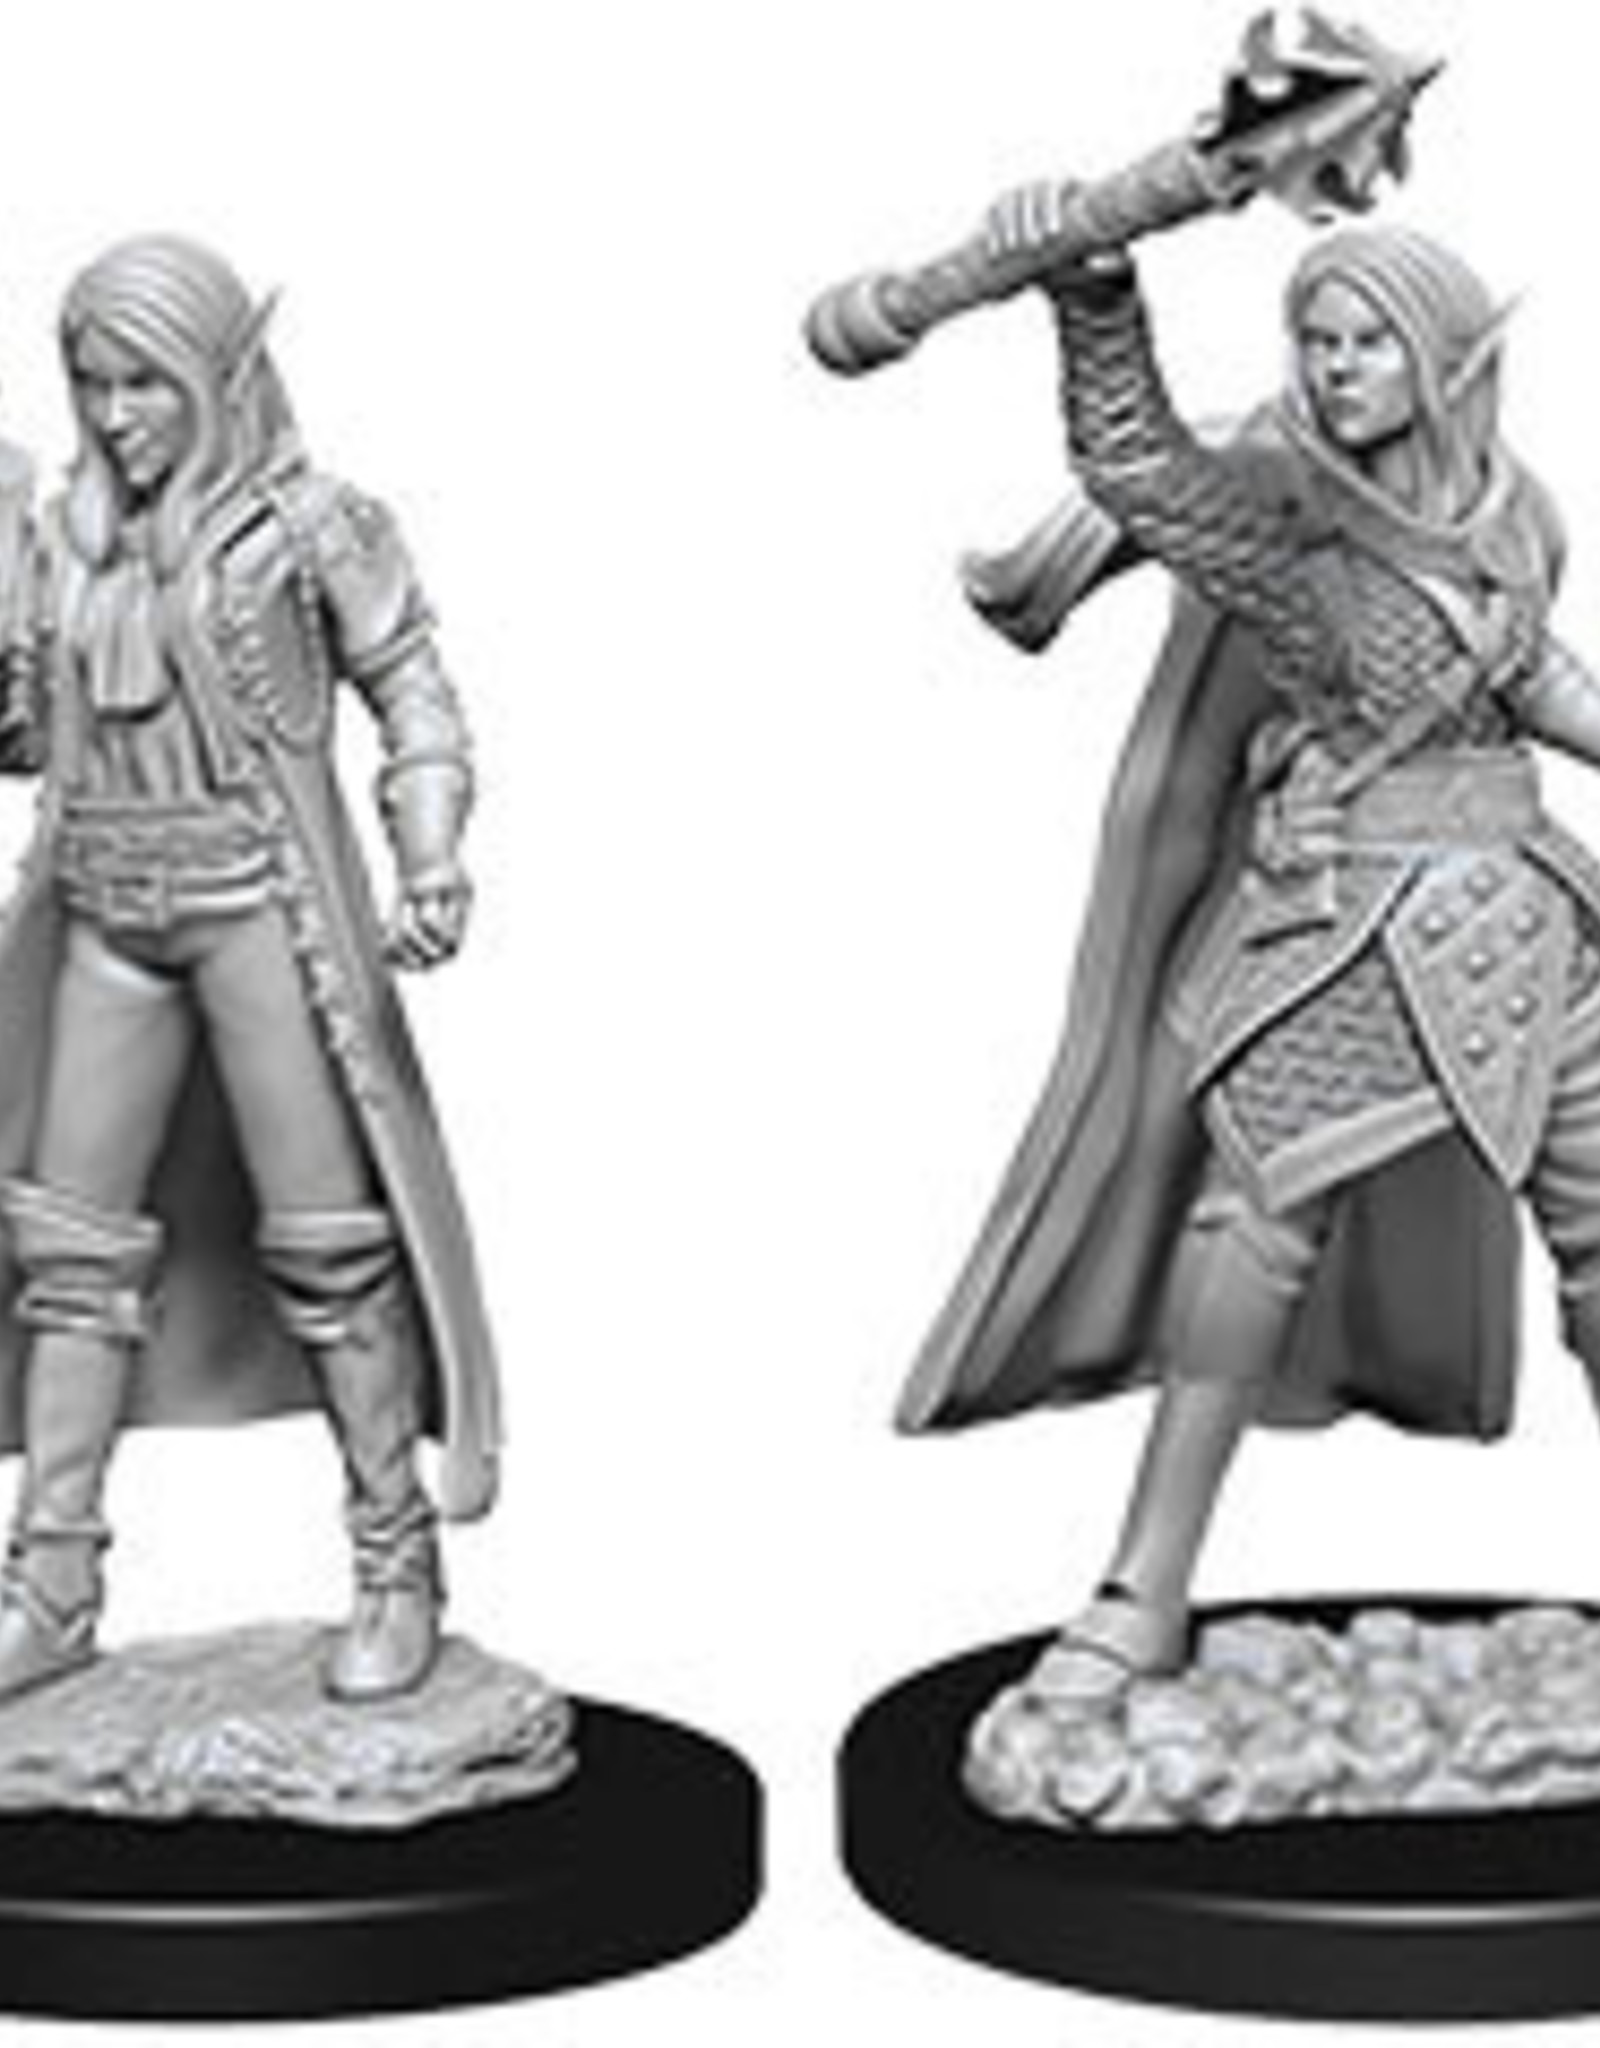 WizKids Dungeons & Dragons Nolzur's Marvelous Miniatures: Female Elf Cleric